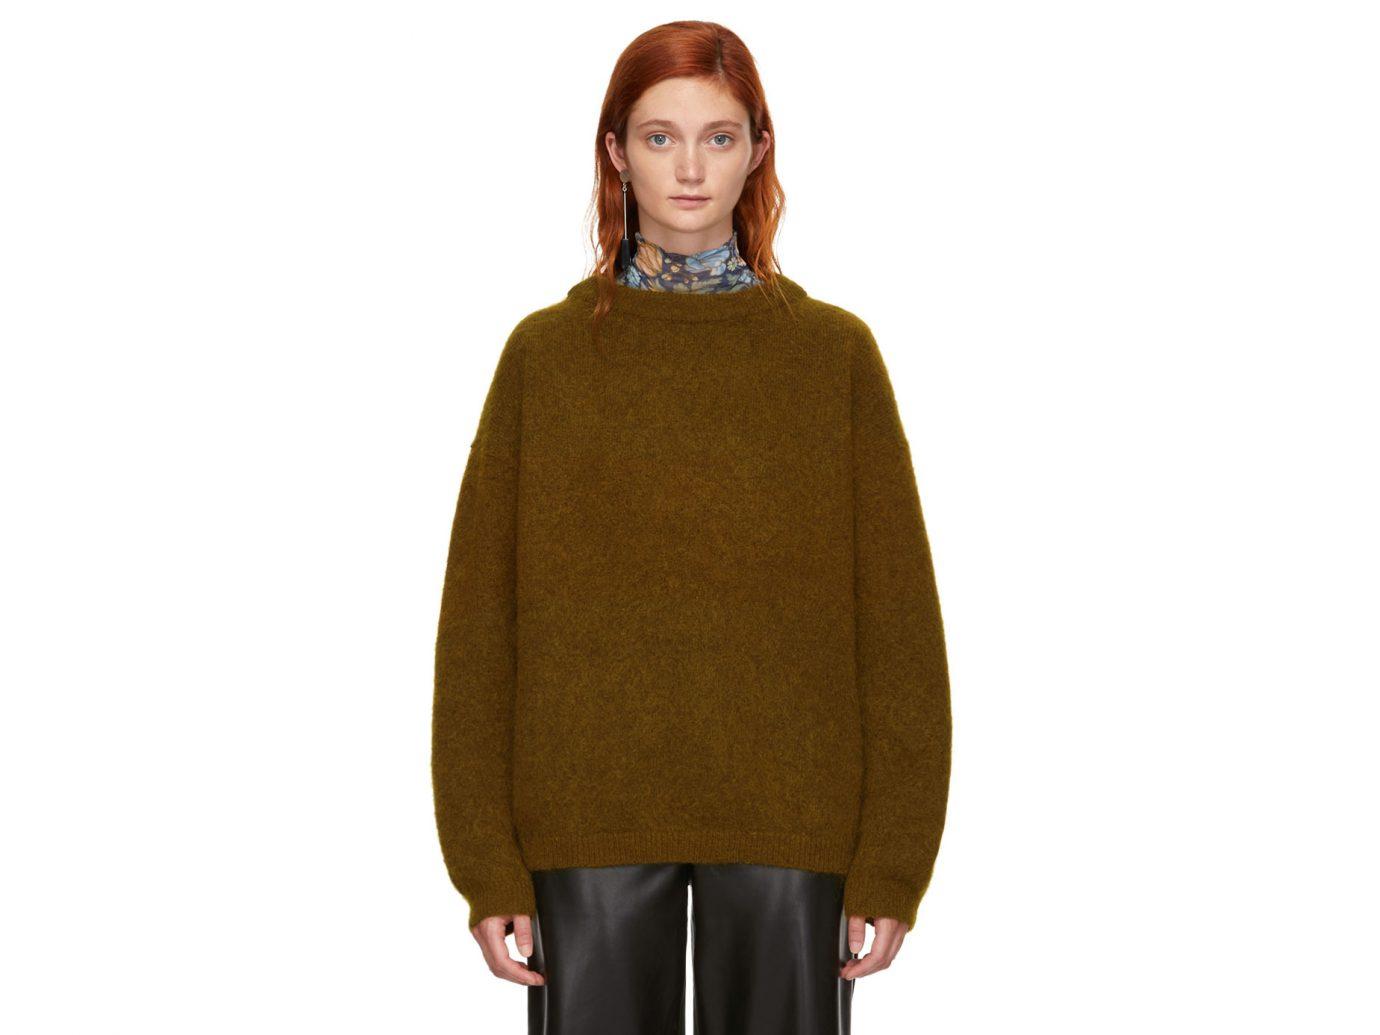 Acne Studios Brown Wool Dramatic Sweater